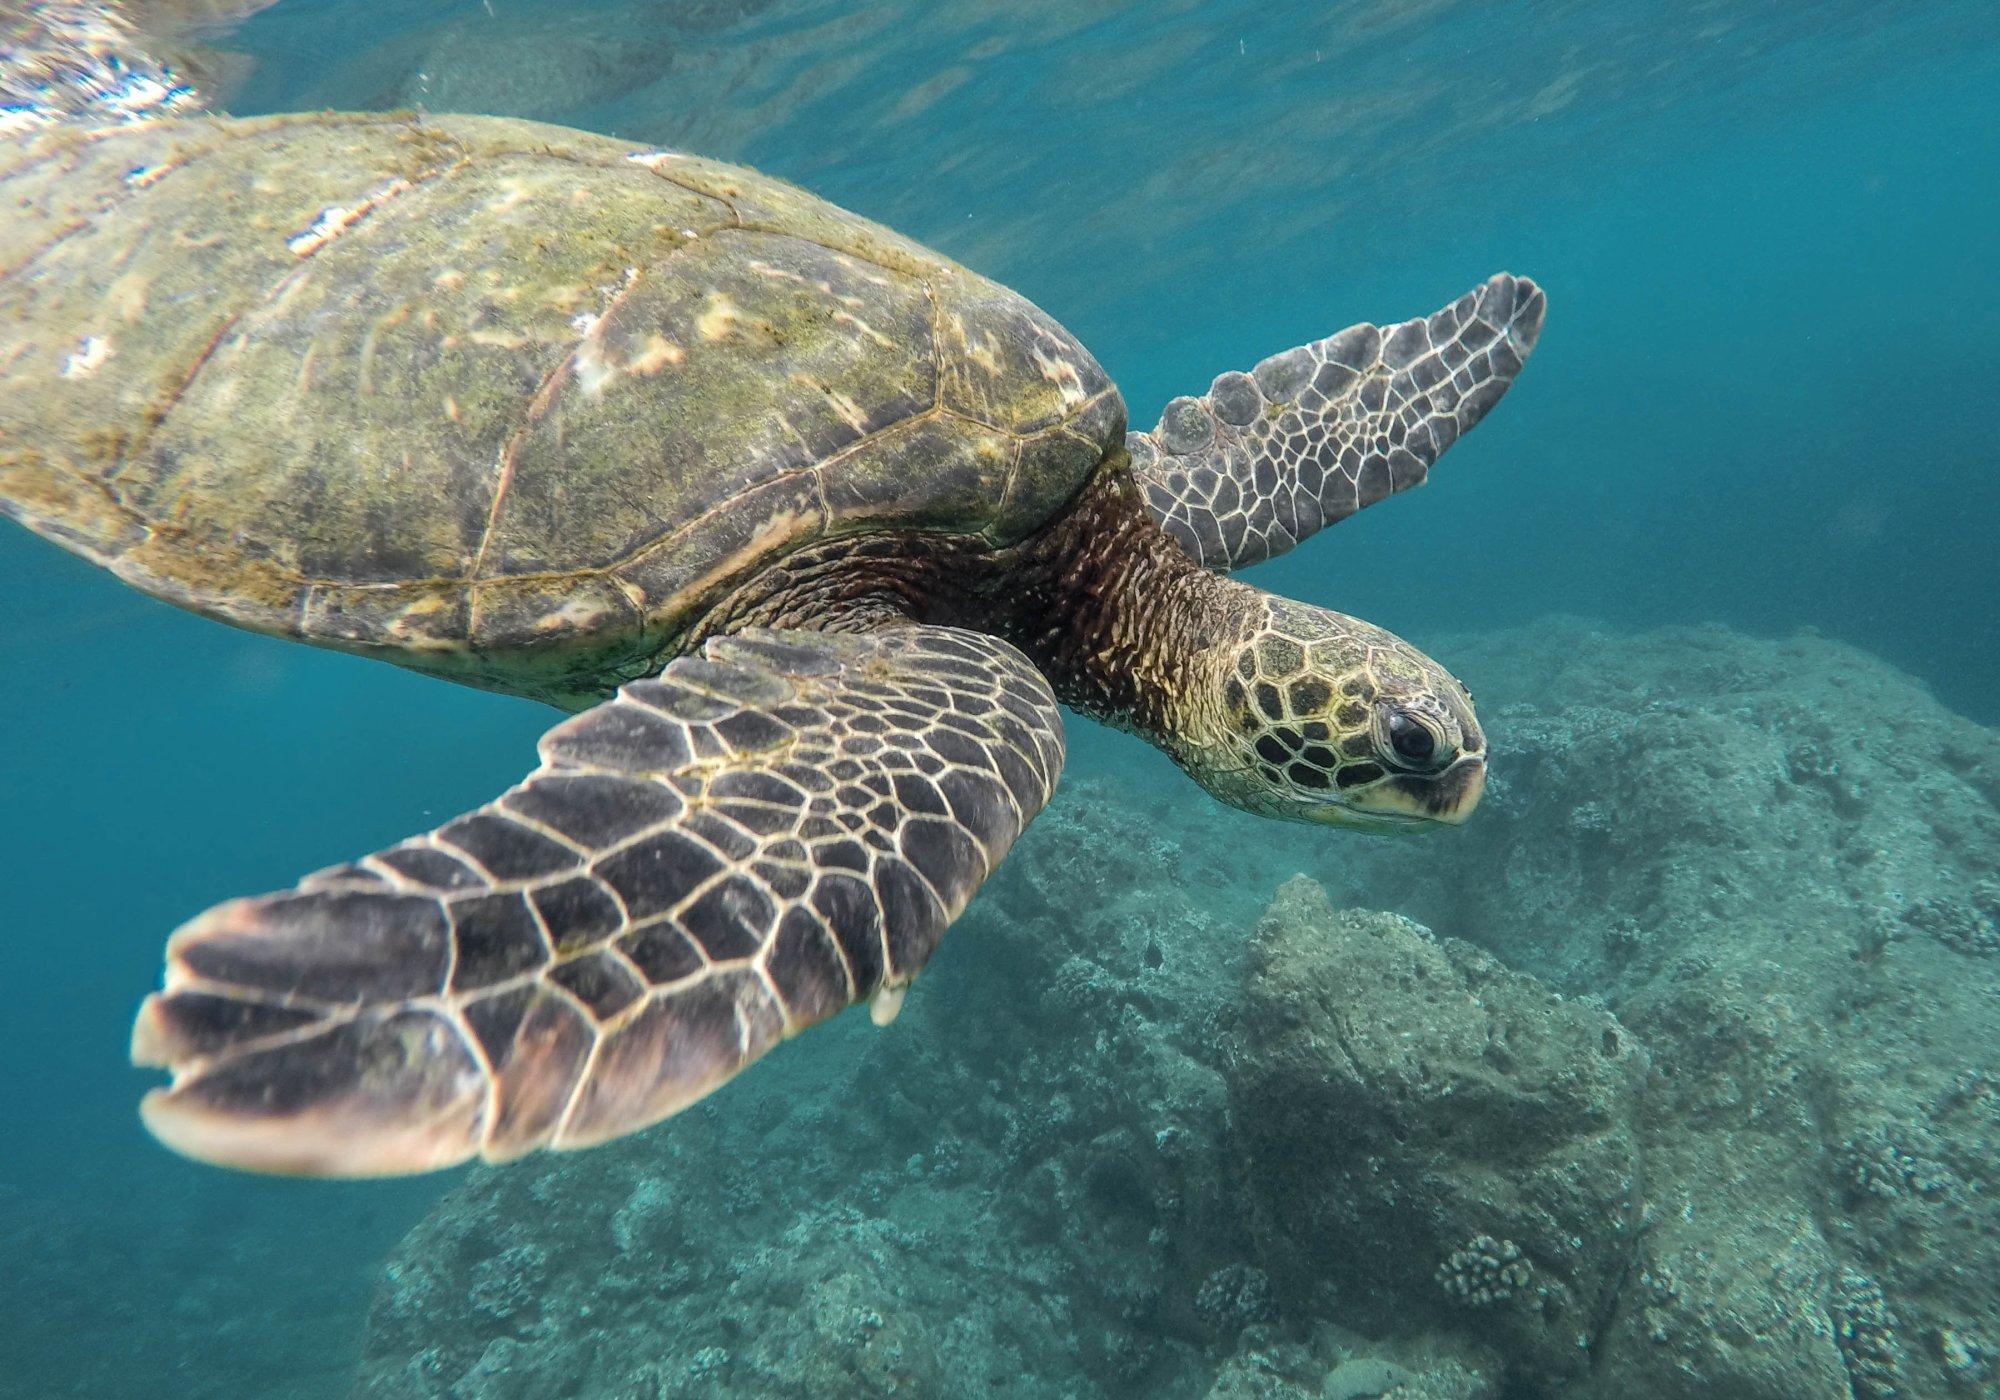 Grüne Galapagos-Meeresschildkröte